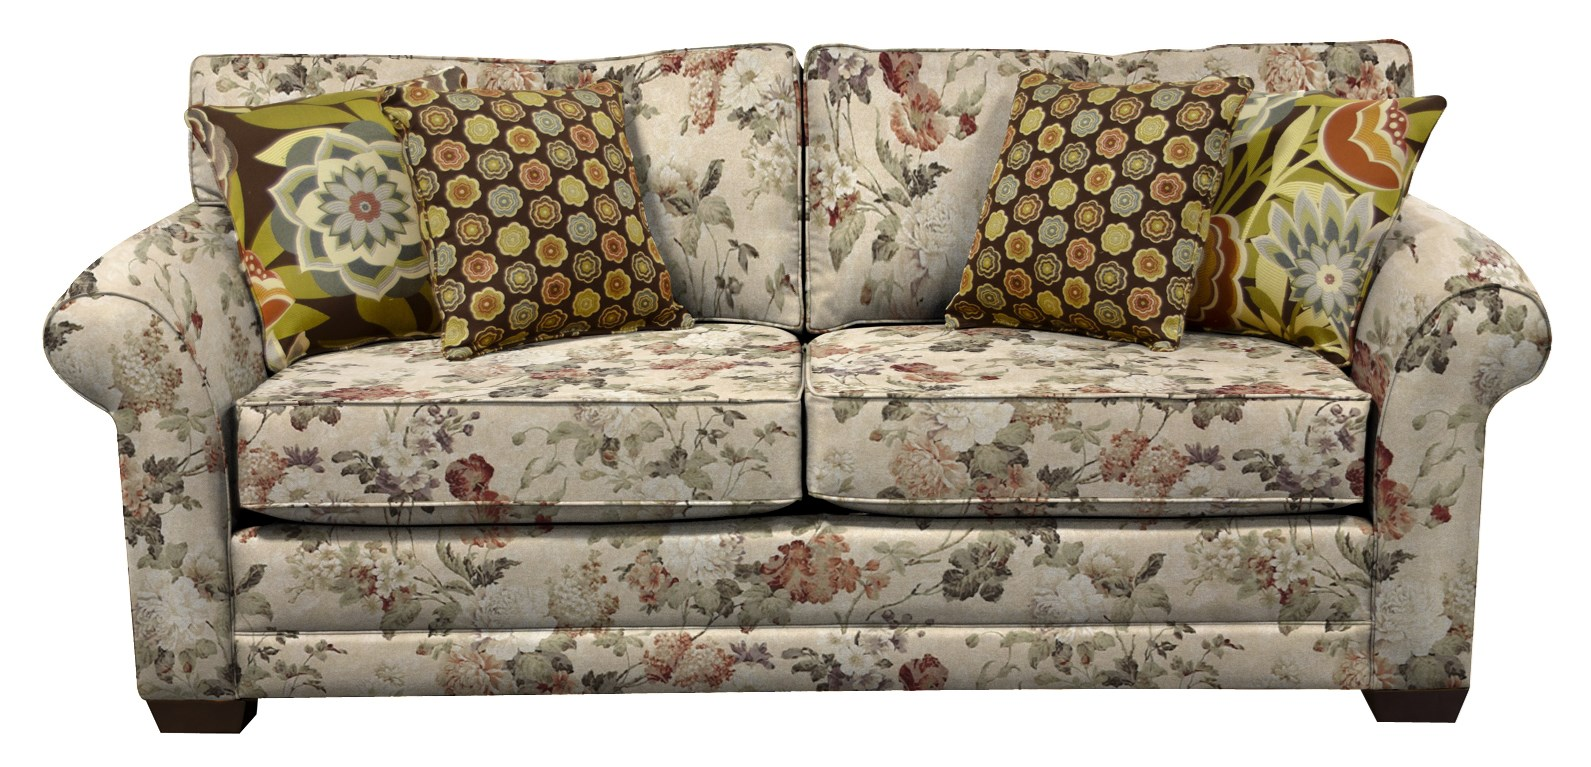 Brantley Queen Sleeper with Air Mattress by England at Lapeer Furniture & Mattress Center